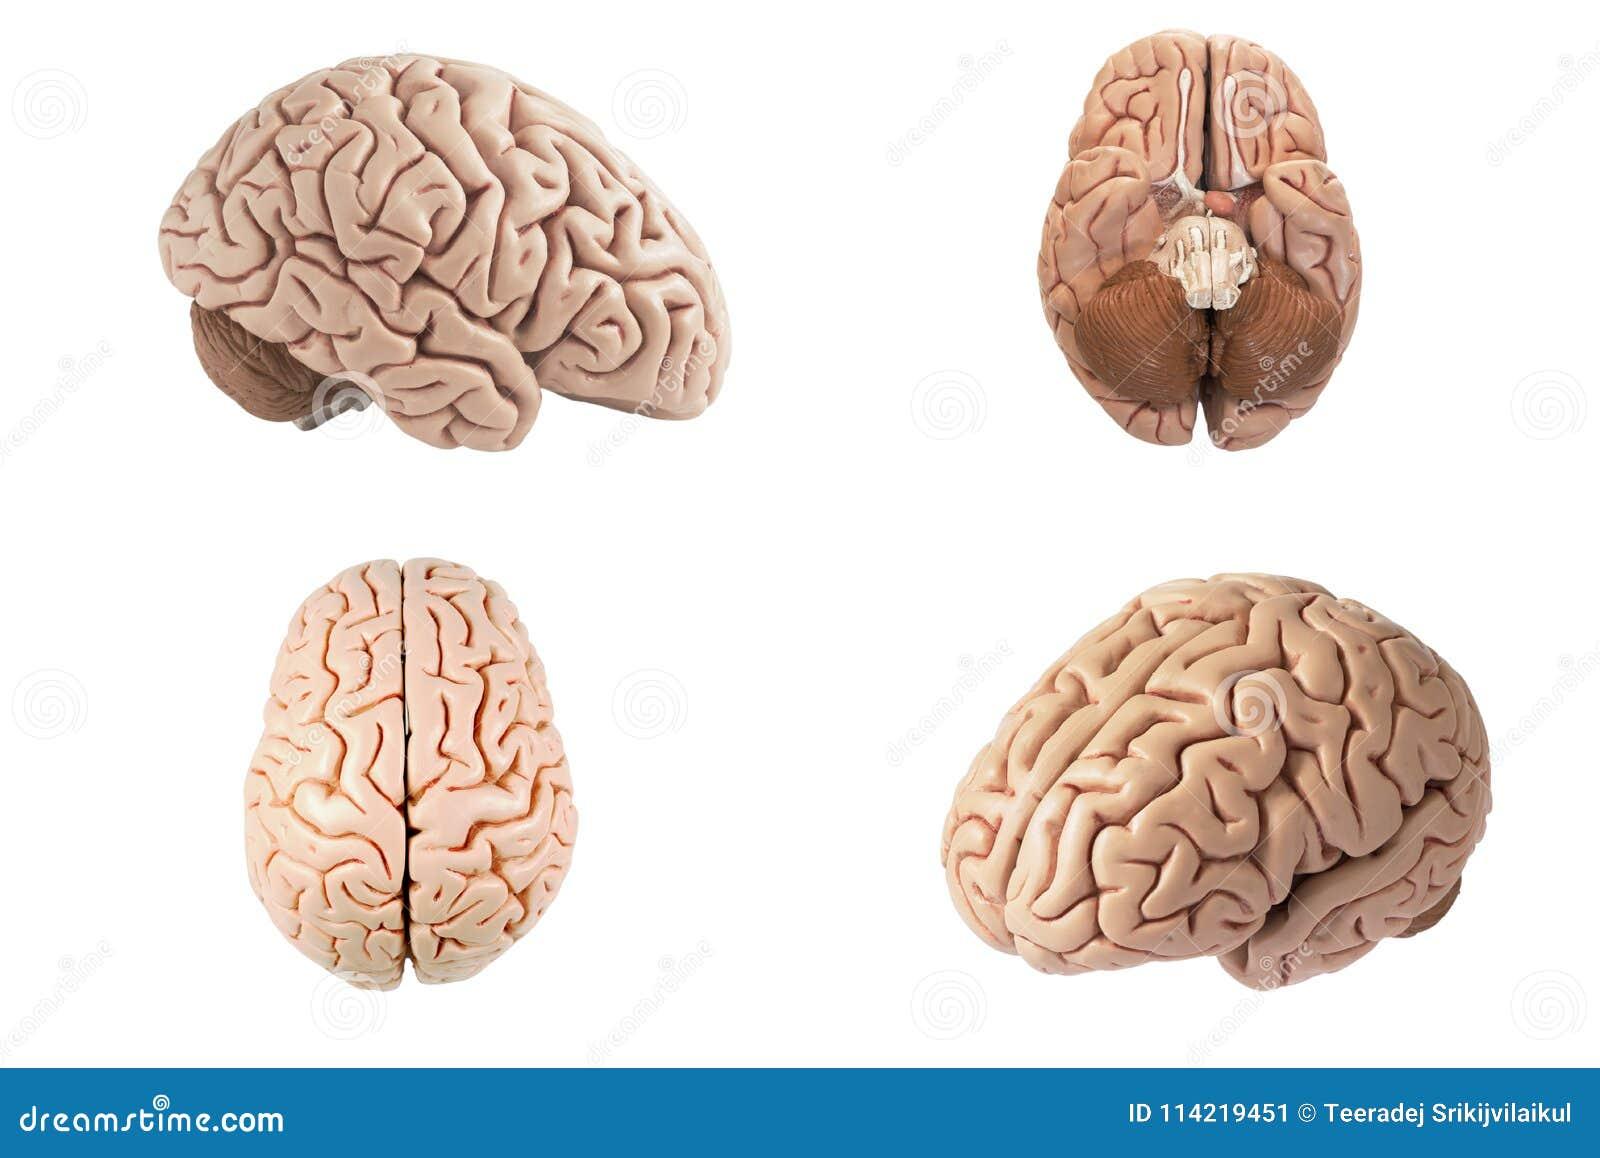 Opinião indiferente do modelo artificial do cérebro humano